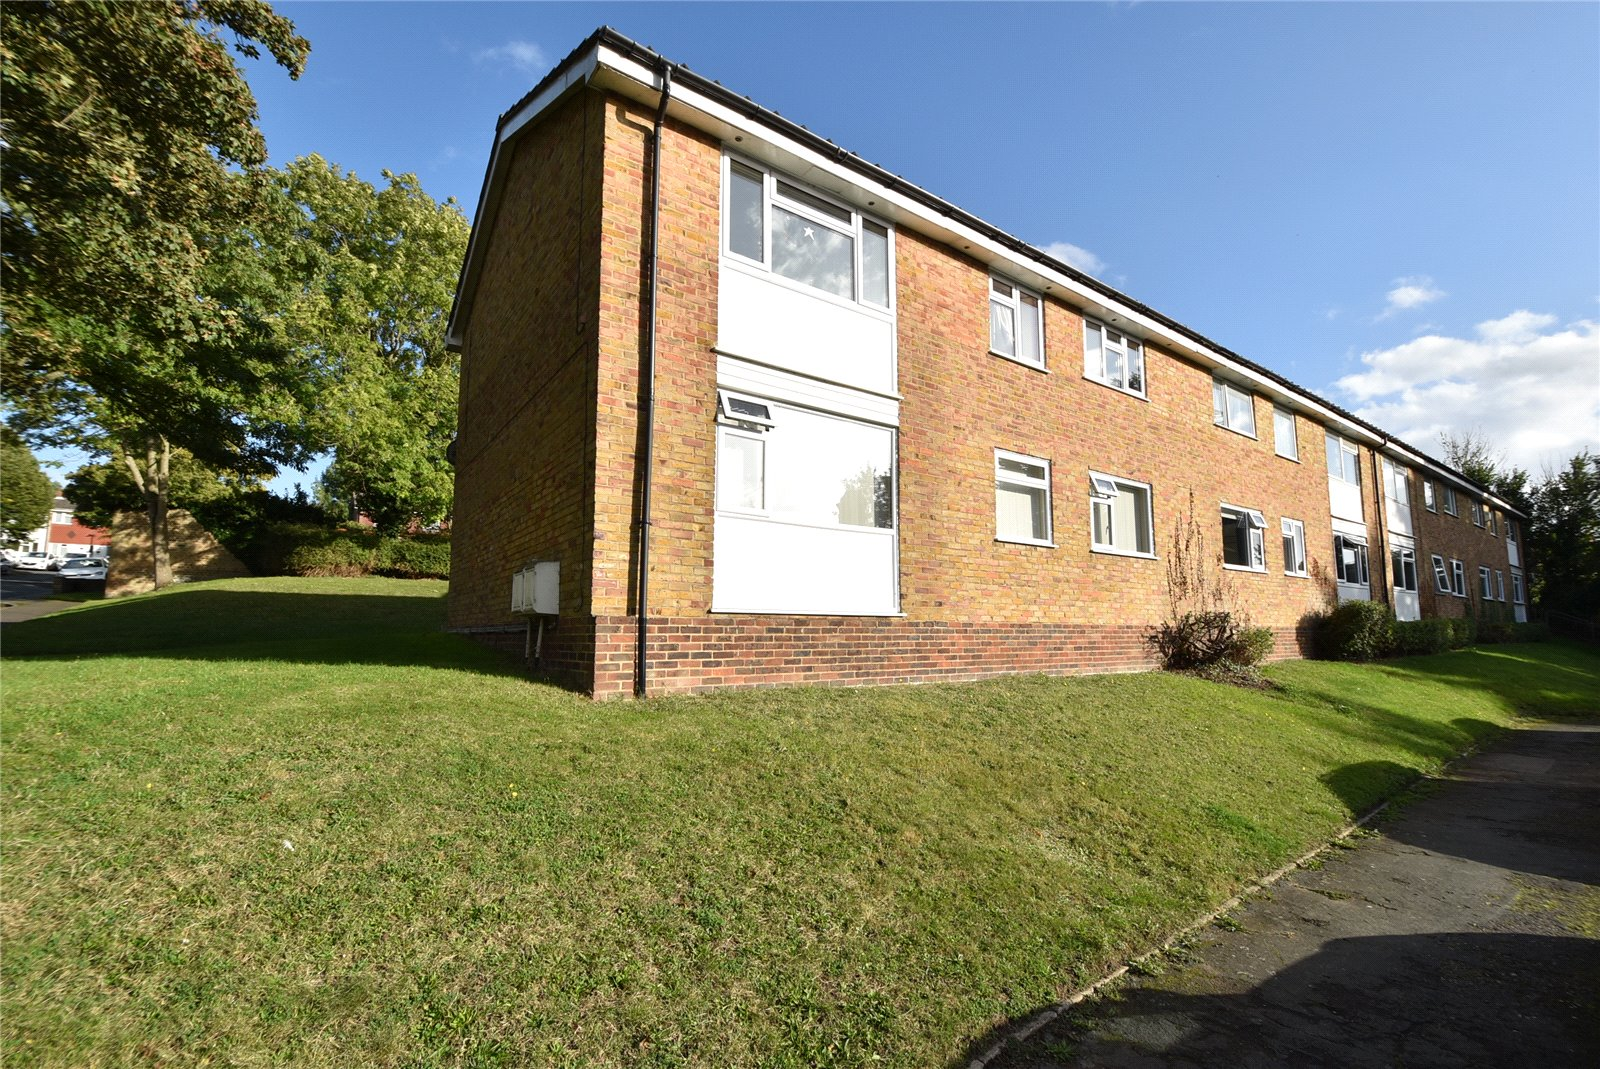 Paddock Close, South Darenth, Dartford, Kent, DA4